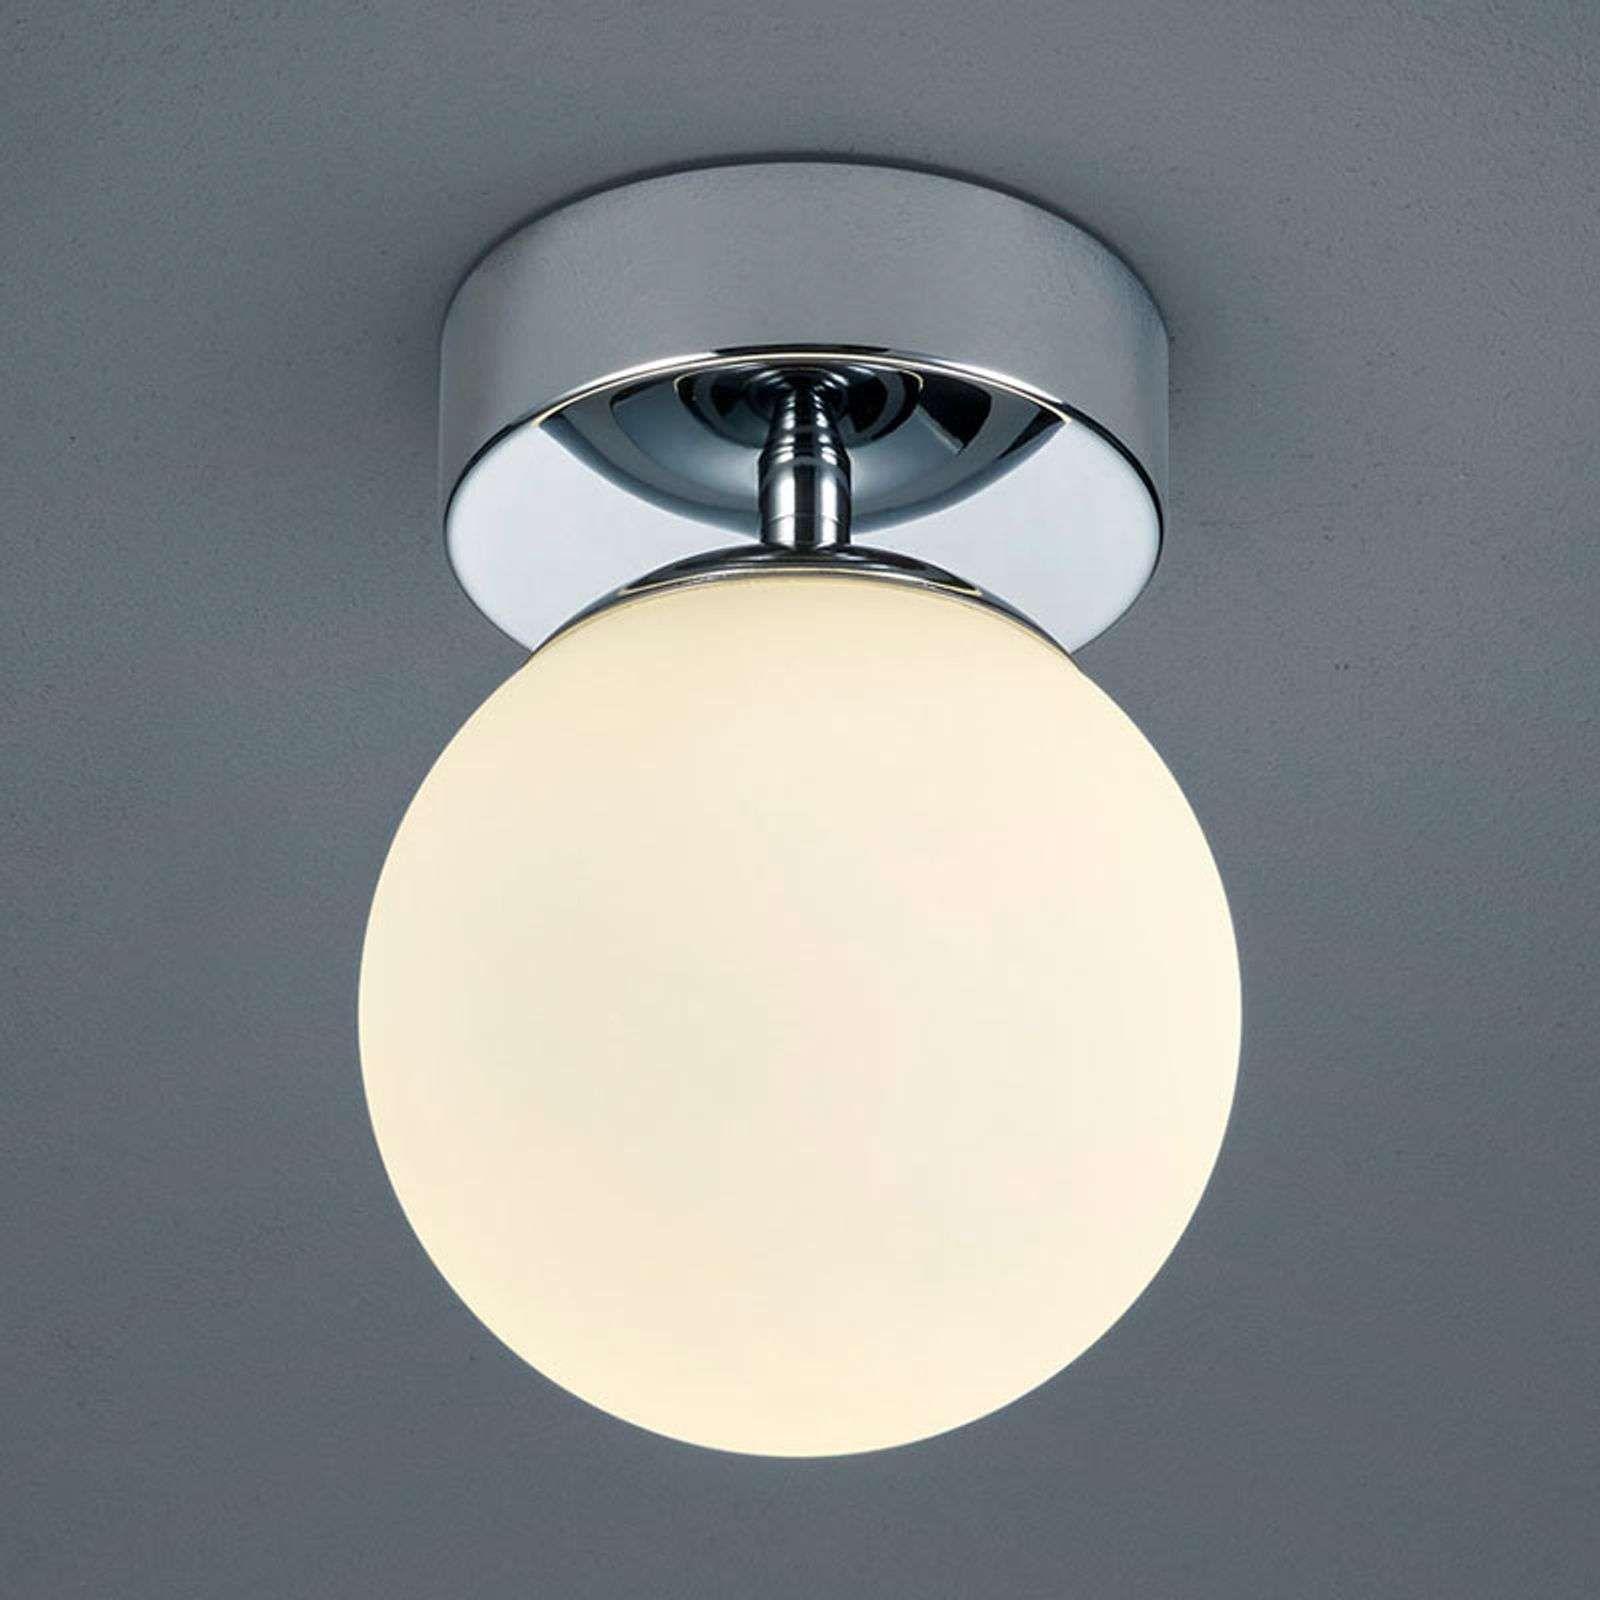 Plafonnier Led Keto En Verre Spherique Plafondlamp Plafondverlichting Badkamer Plafondlamp